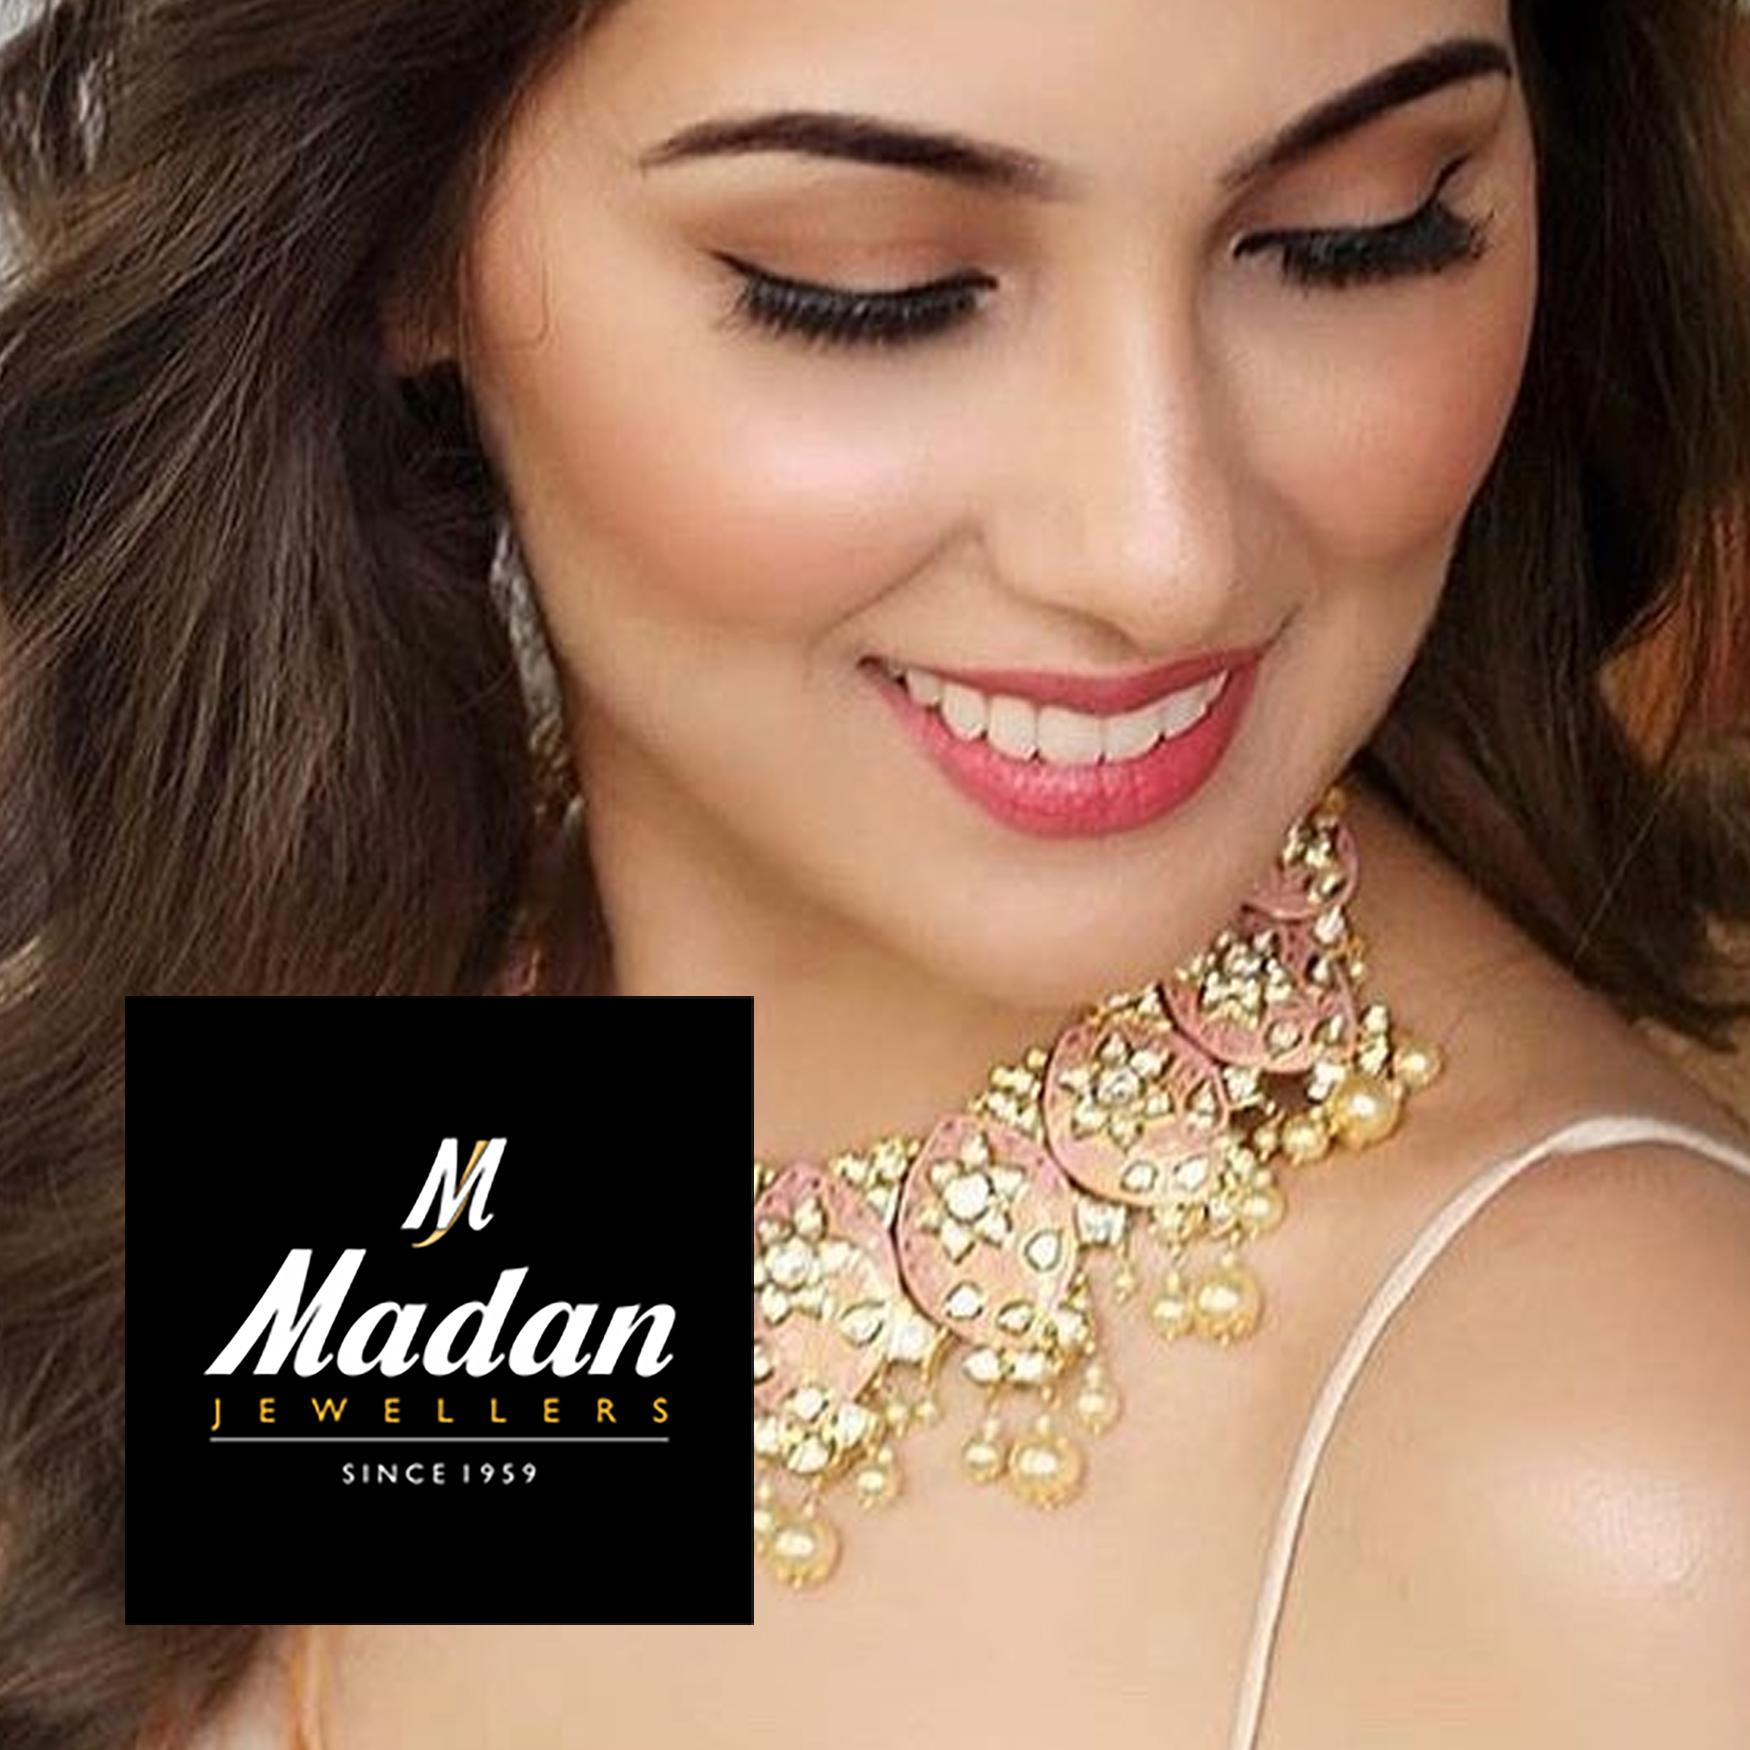 Madan Jewellers